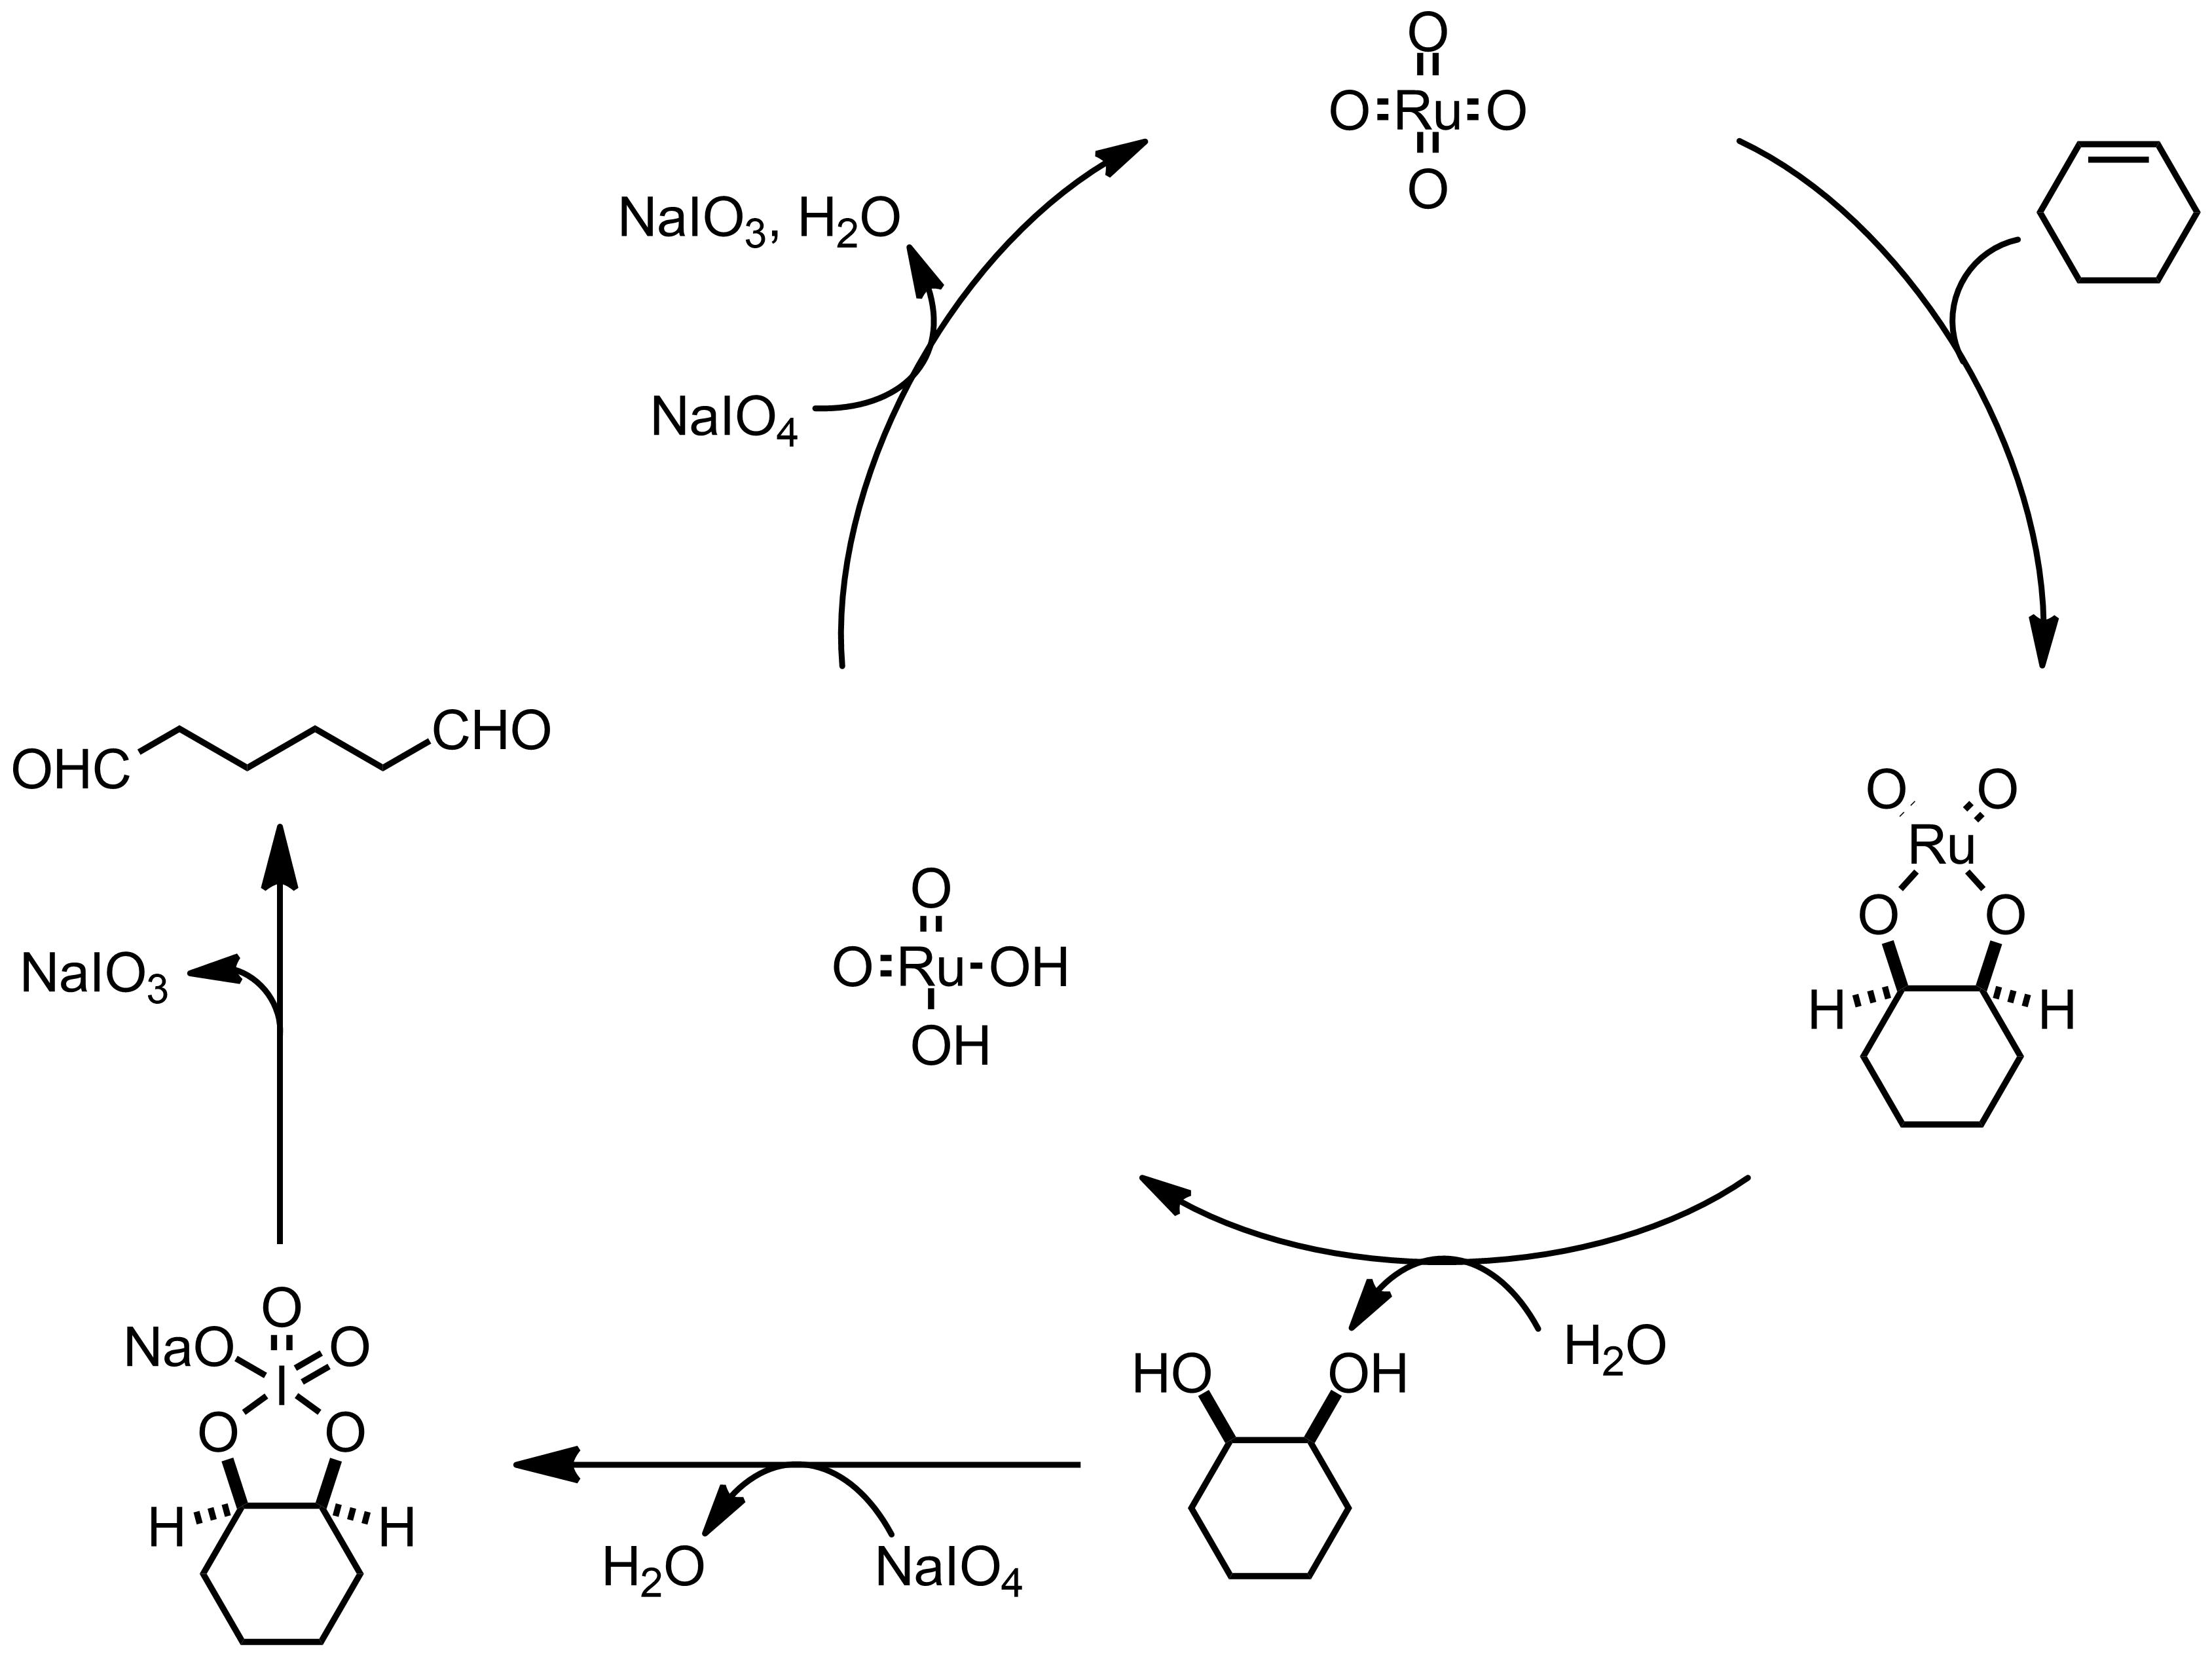 Mechanism of the Lemieux-Johnson Oxidation